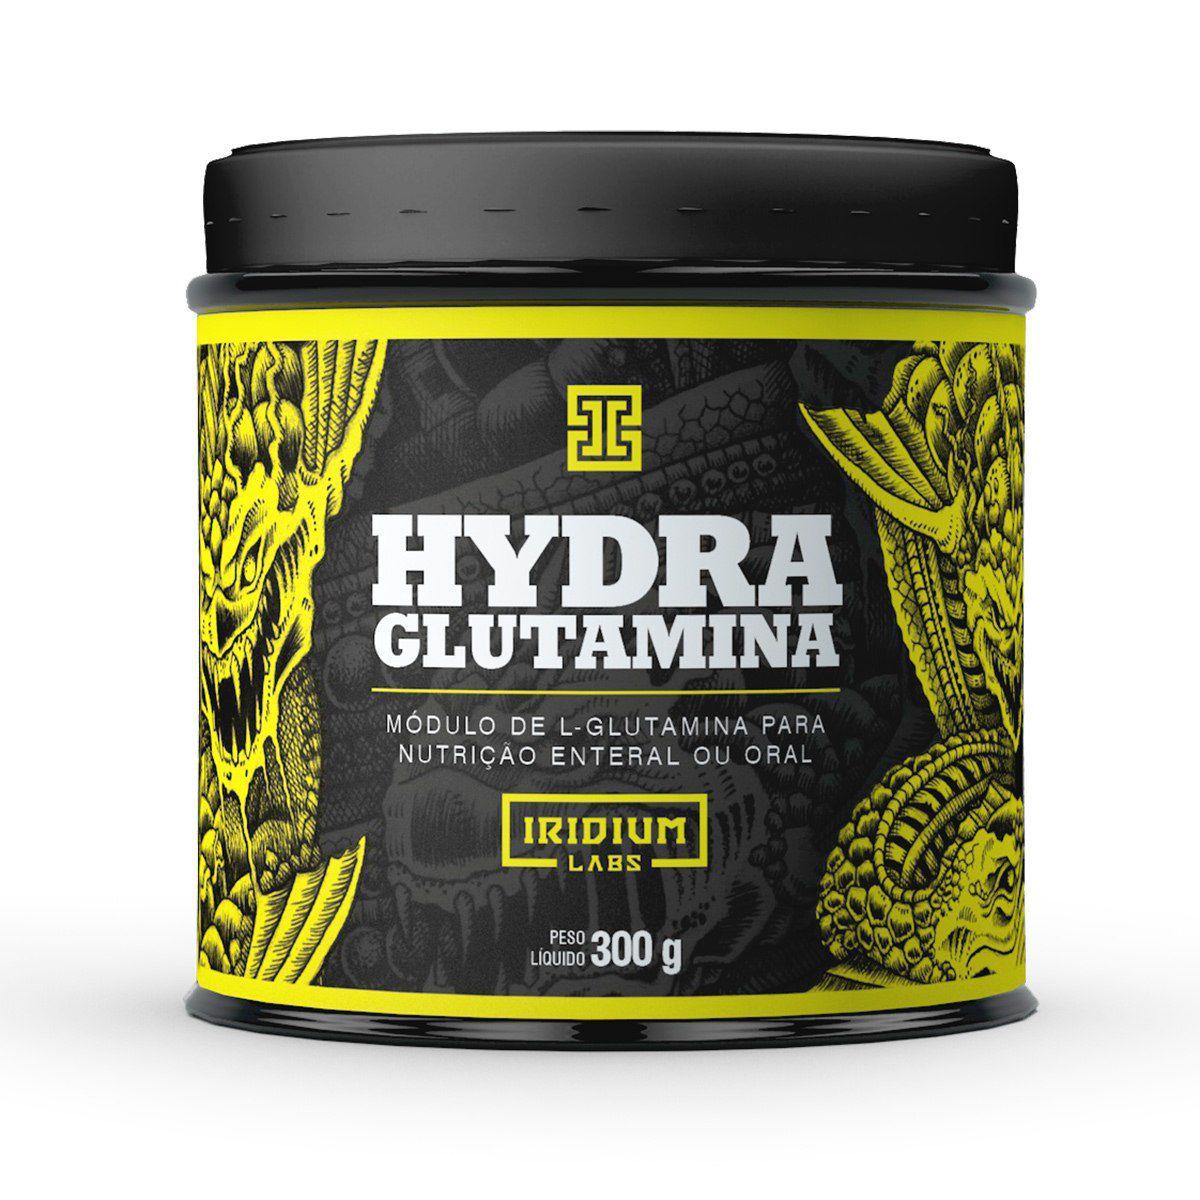 Glutamina Hydra Iridium Labs - 300g